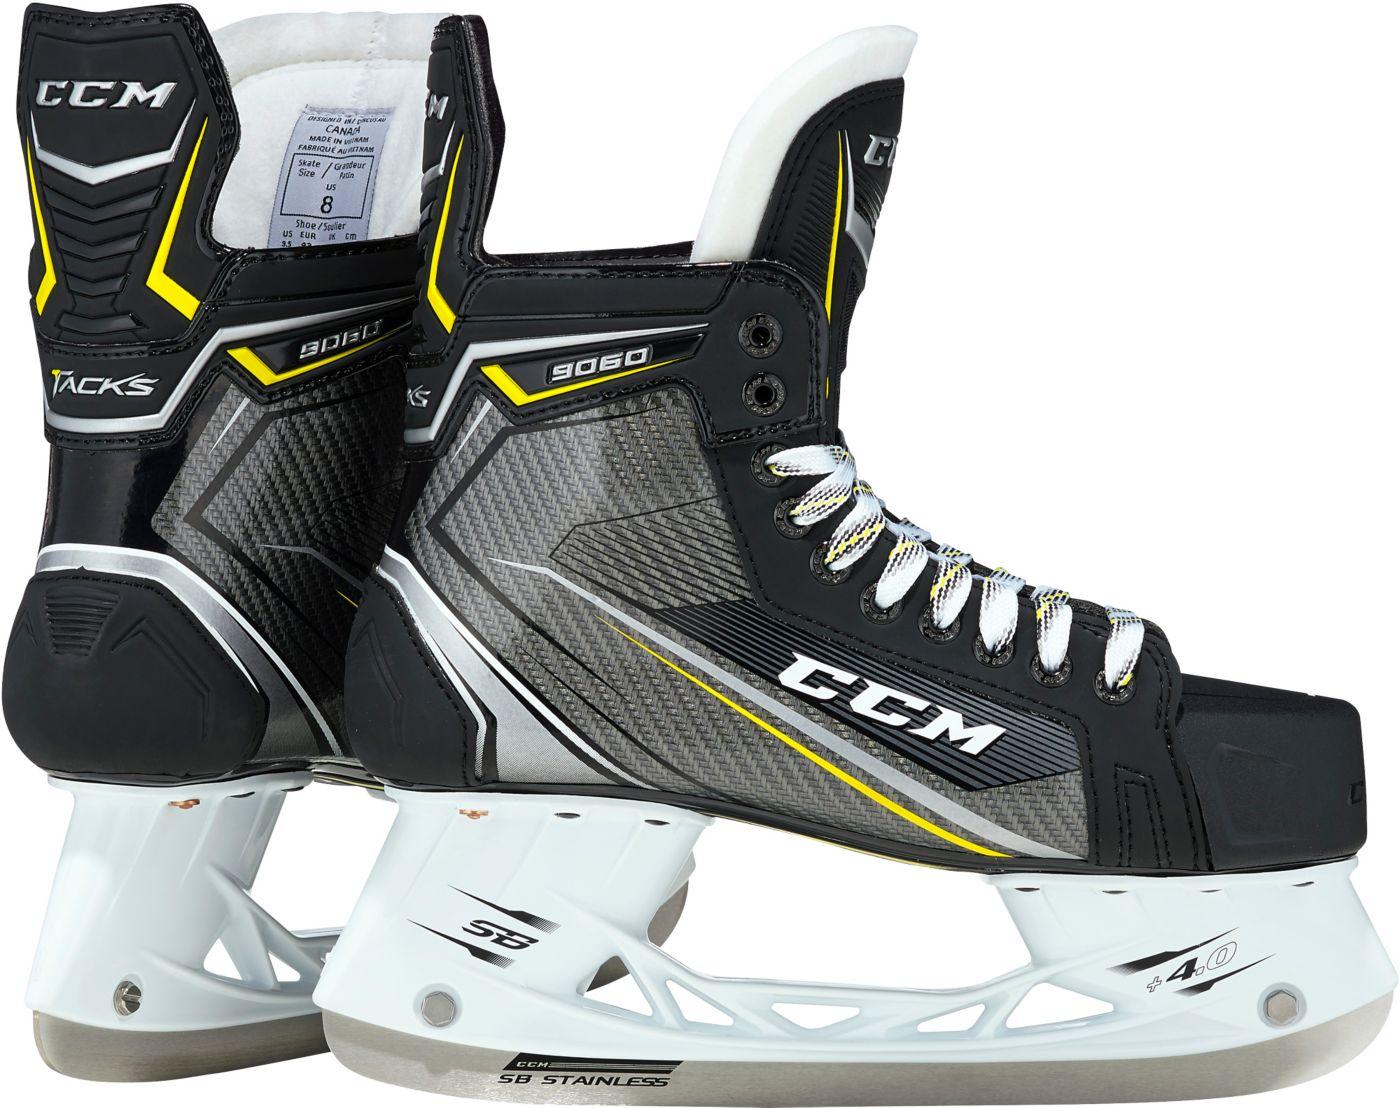 CCM Youth Tacks 9060 Ice Hockey Skates